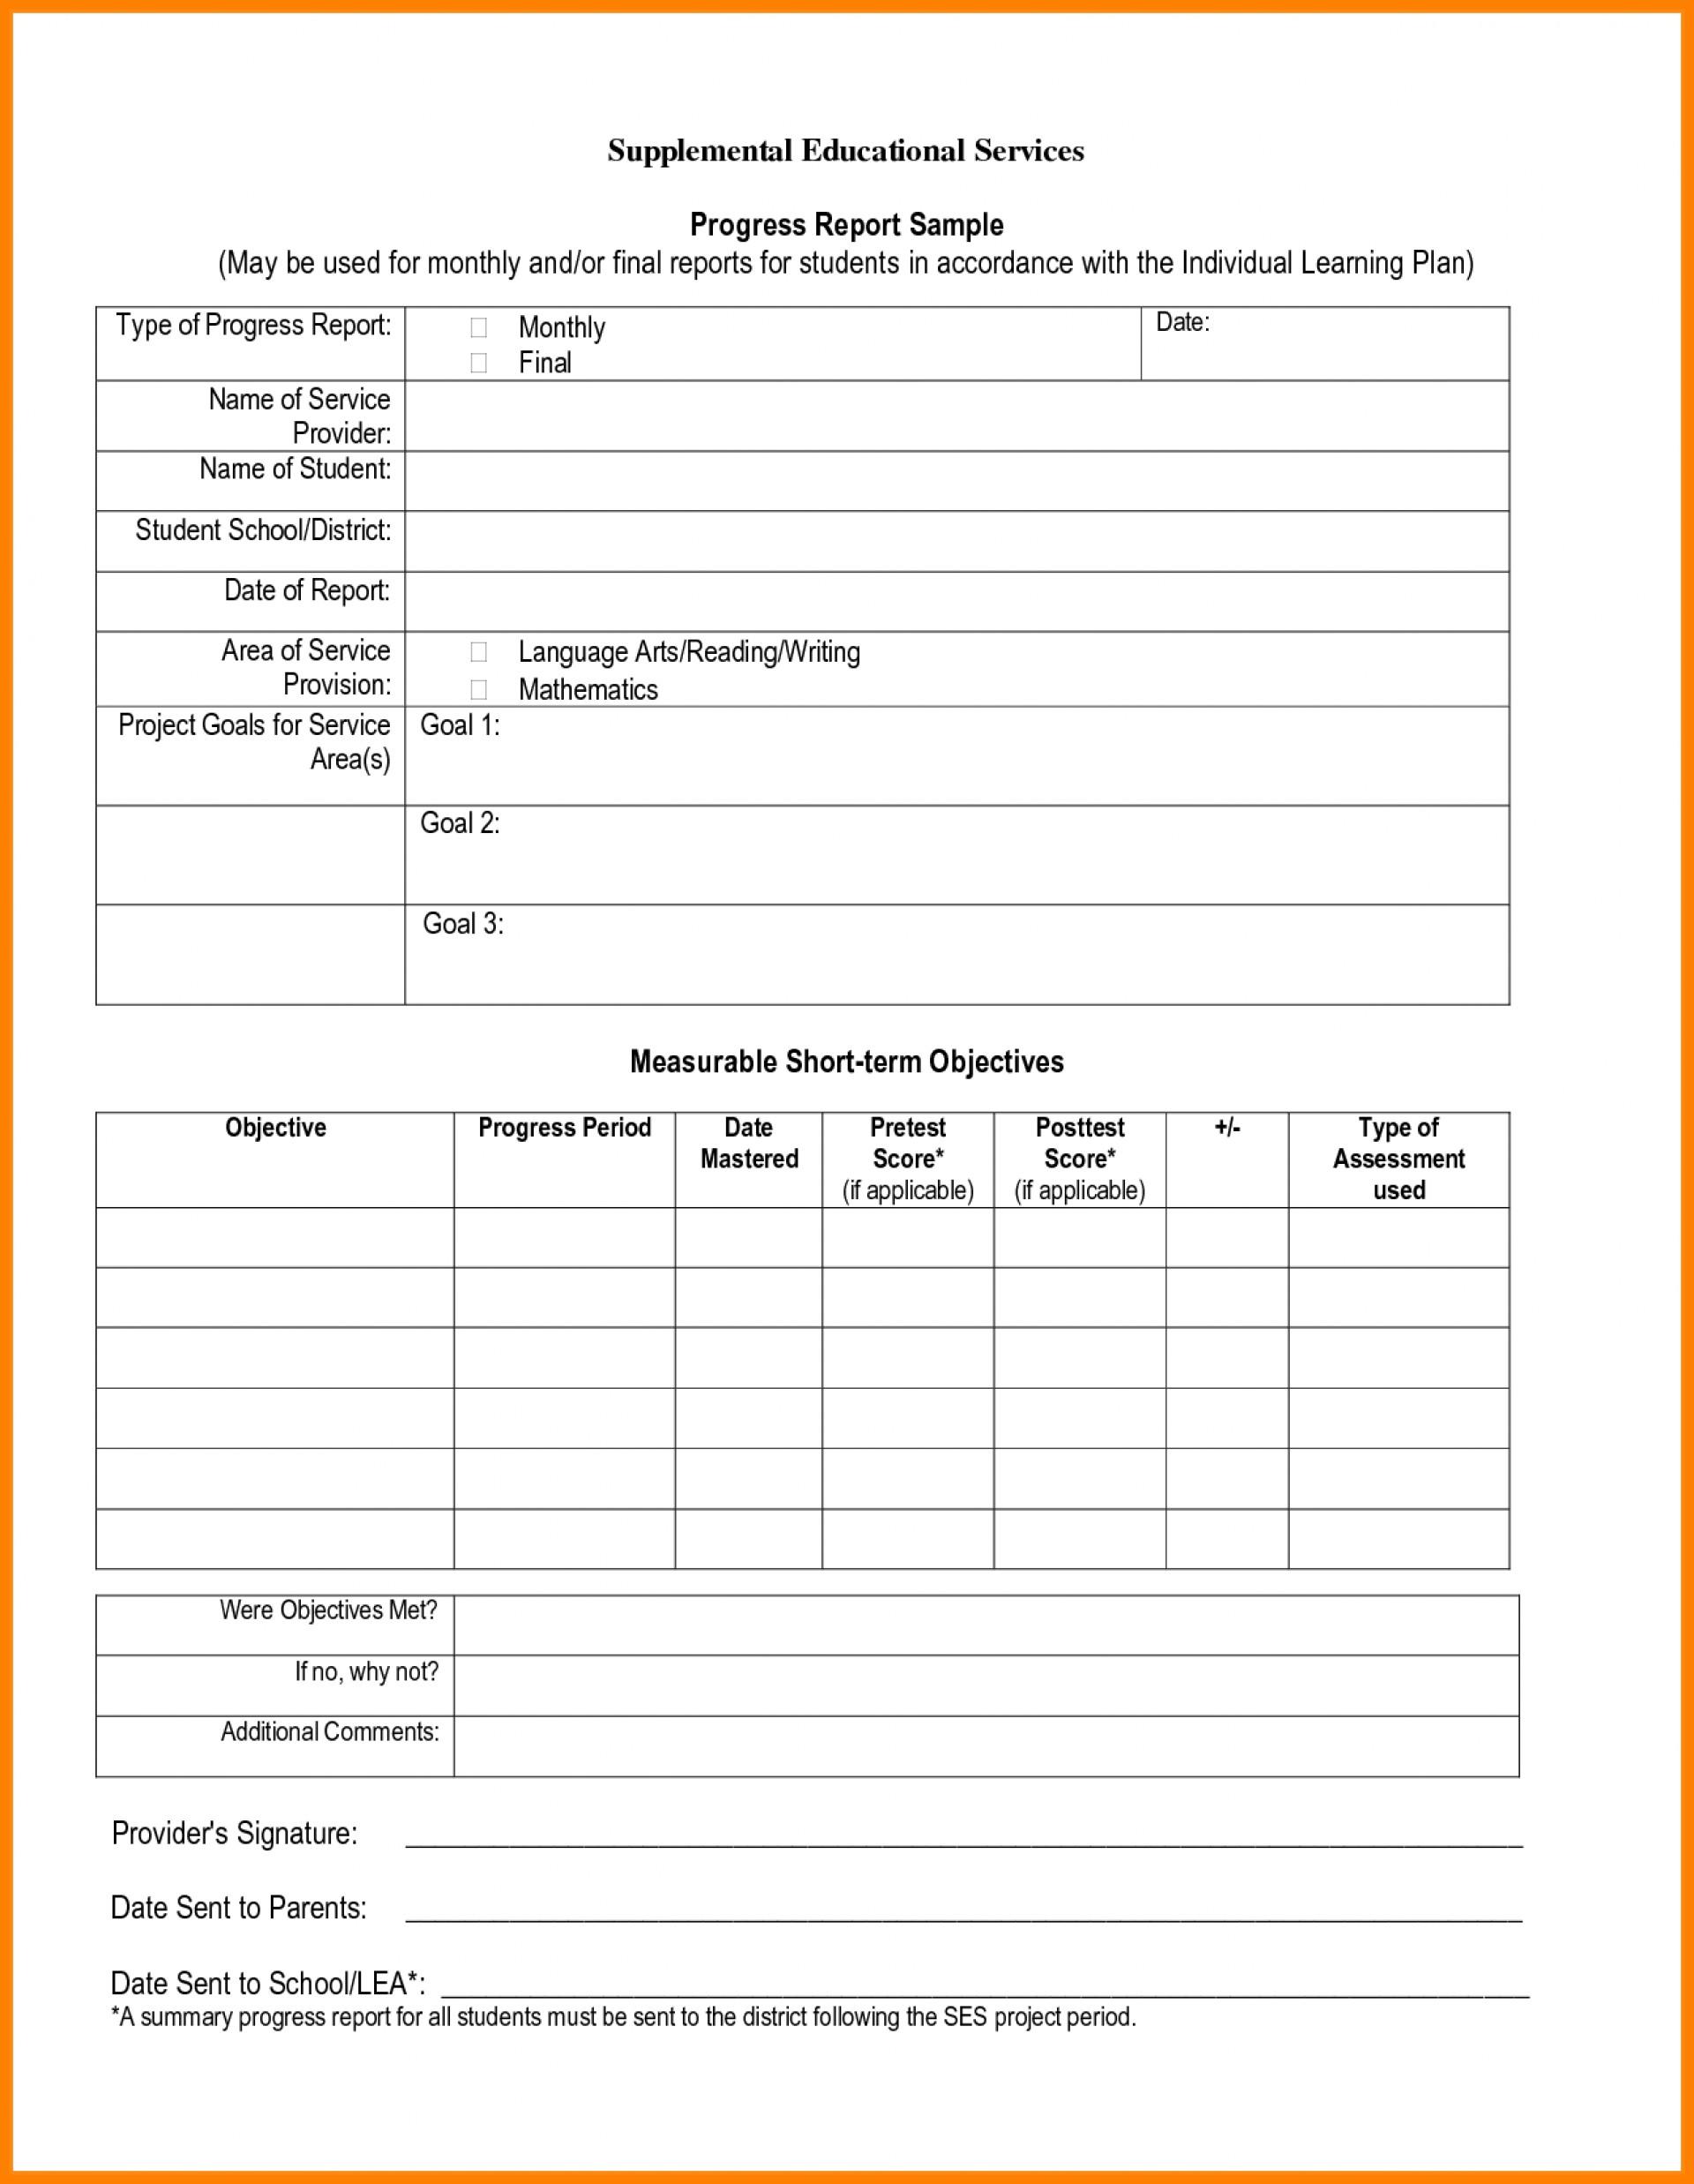 002 Student Progress Report Template Beautiful Ideas Sample throughout School Progress Report Template